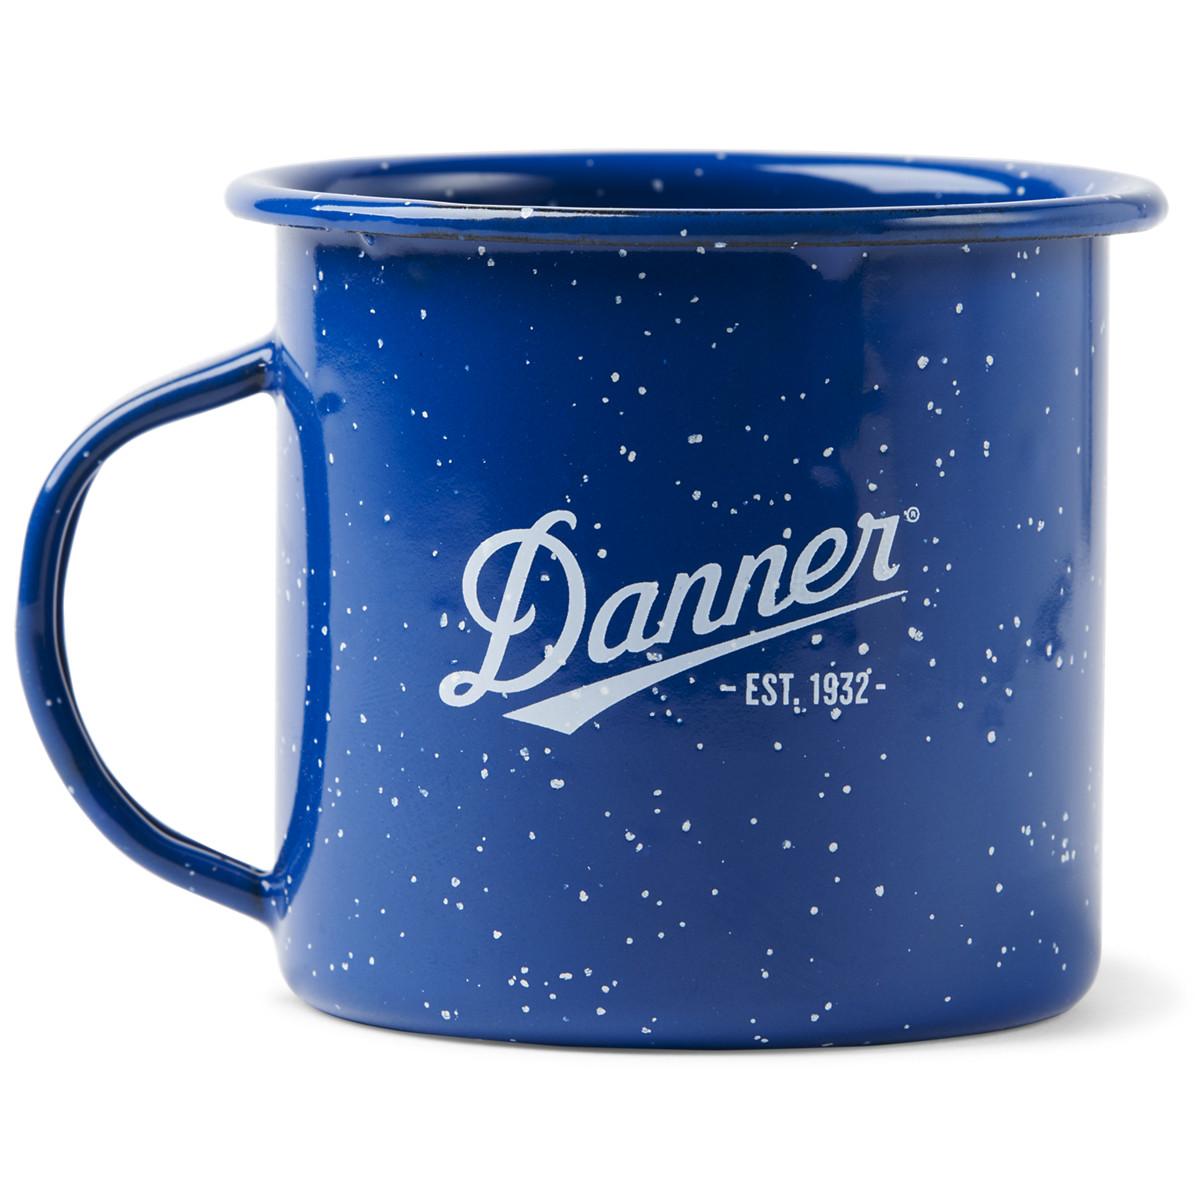 Danner Enamelware 12oz Mug - Blue